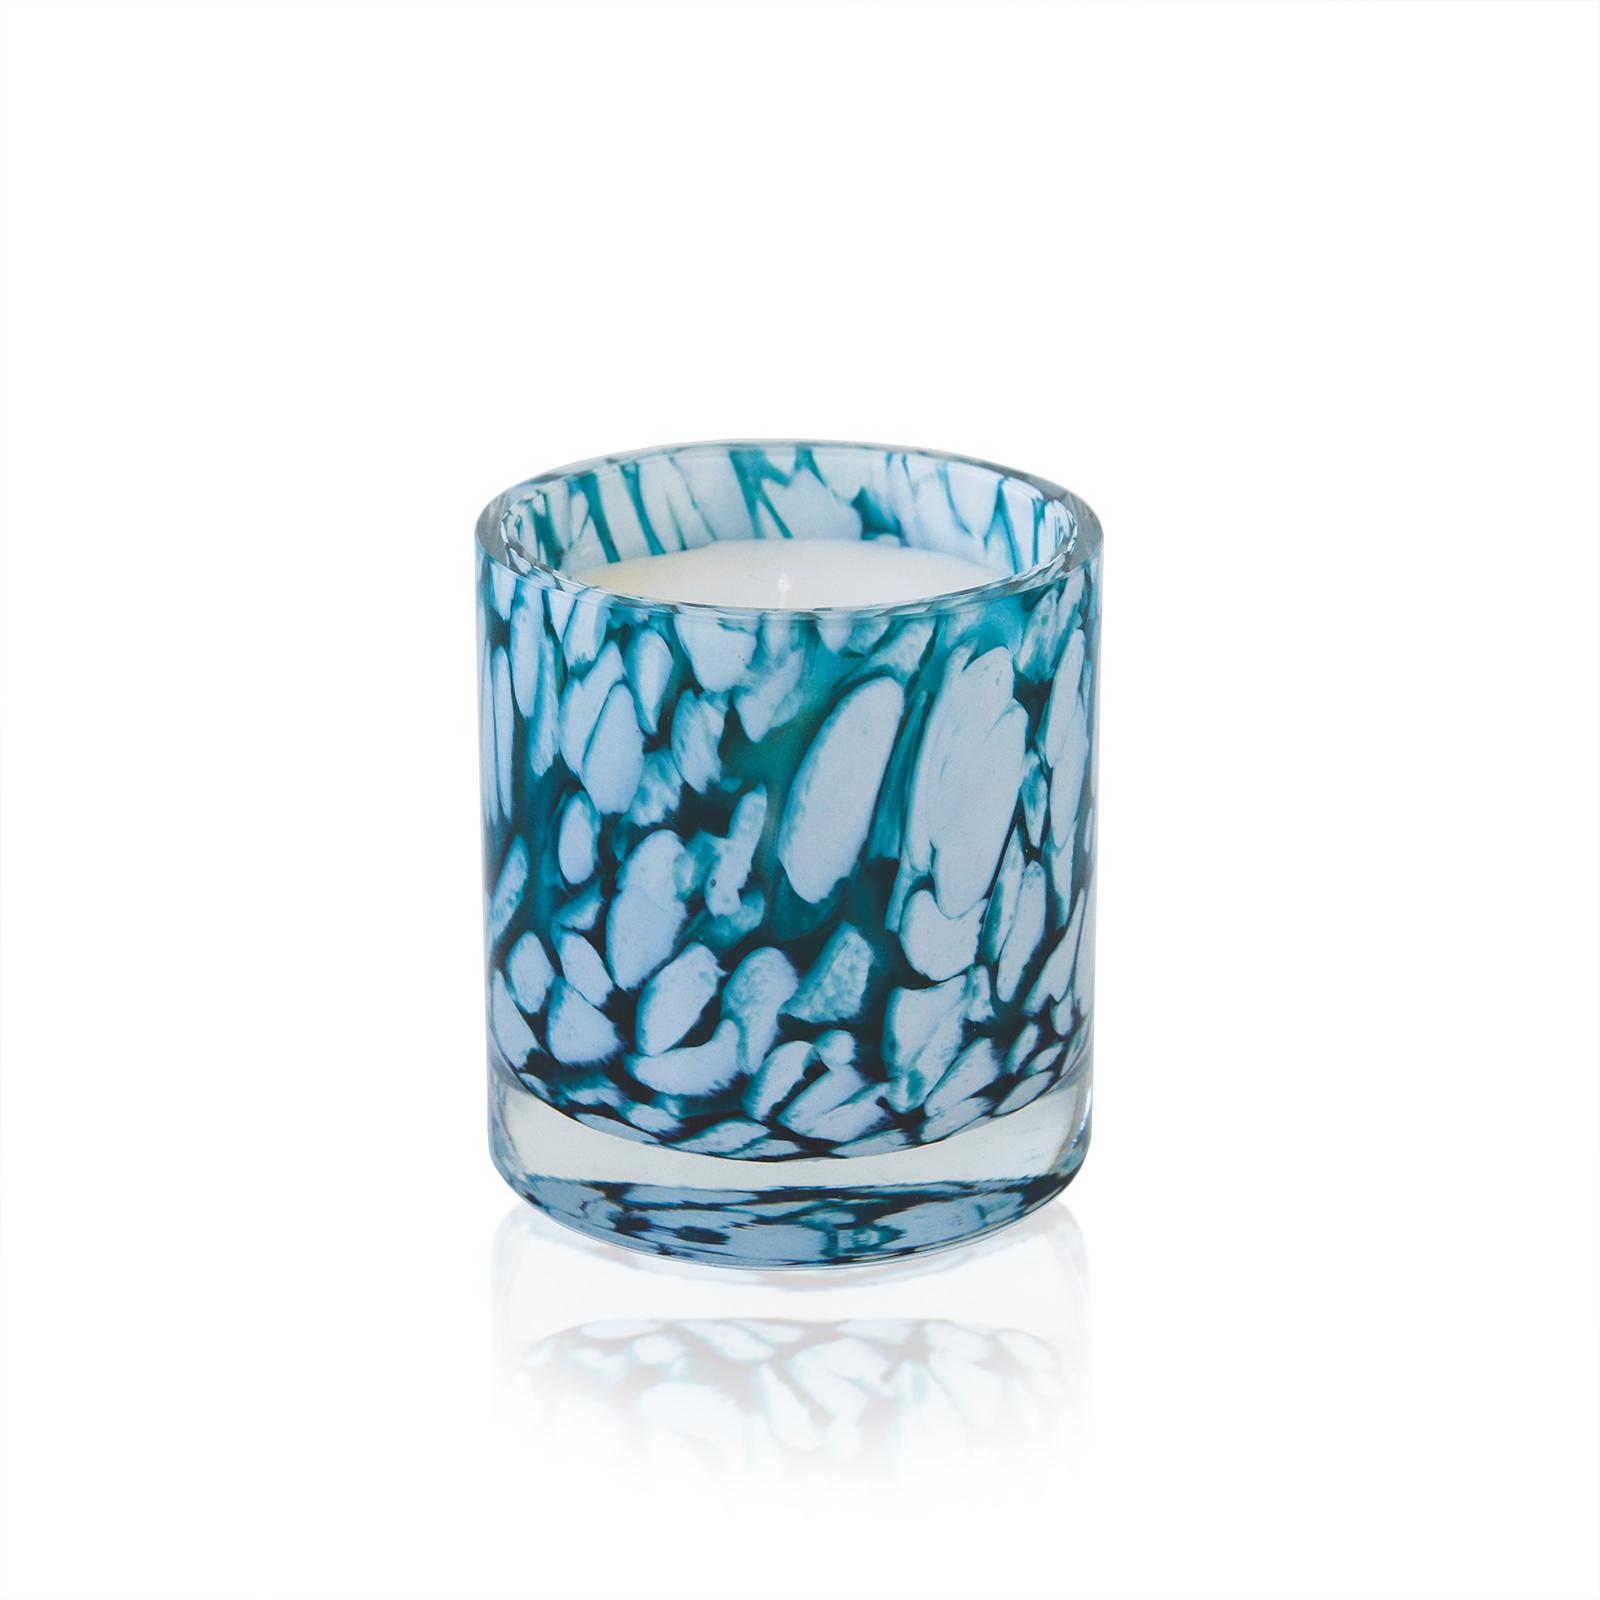 Duftkerze mundgeblasenem Glas: Anis, Minze, Vanille